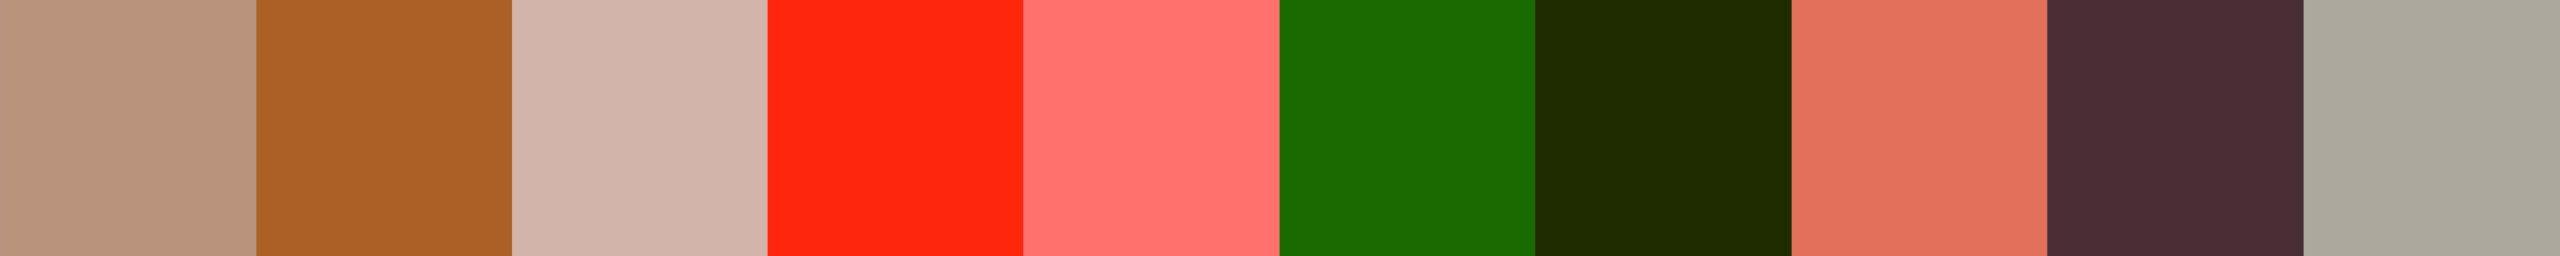 251 Revaptia Color Palette